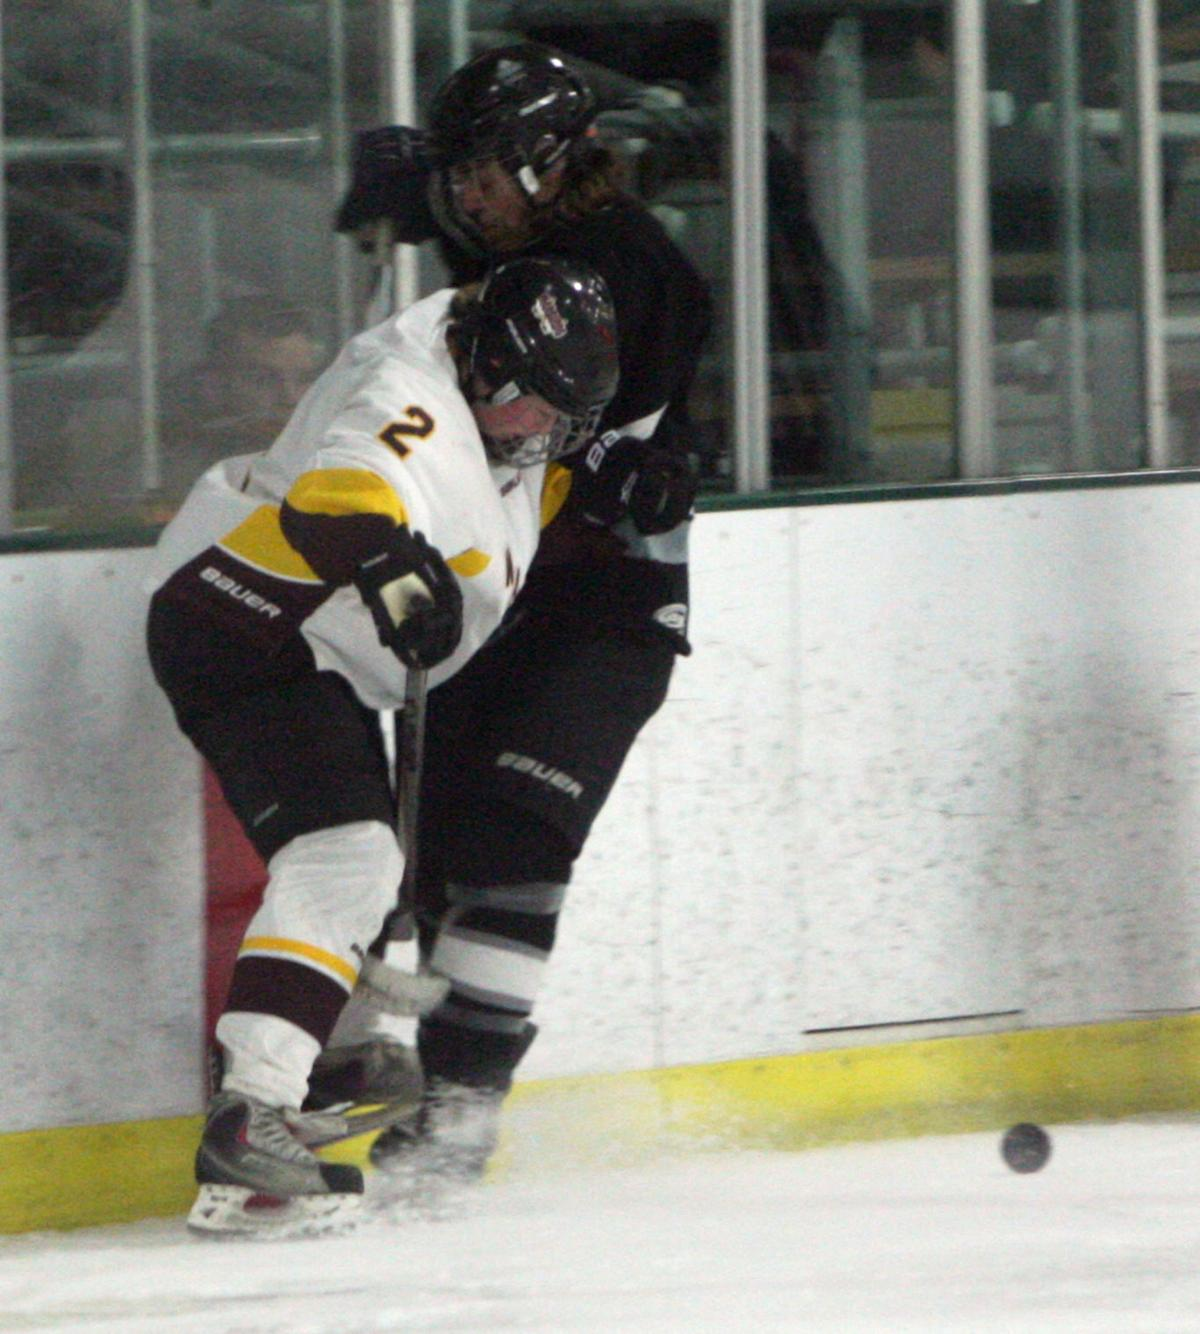 Prep girls hockey photo: Sun Prairie co-op's Margo Thousand